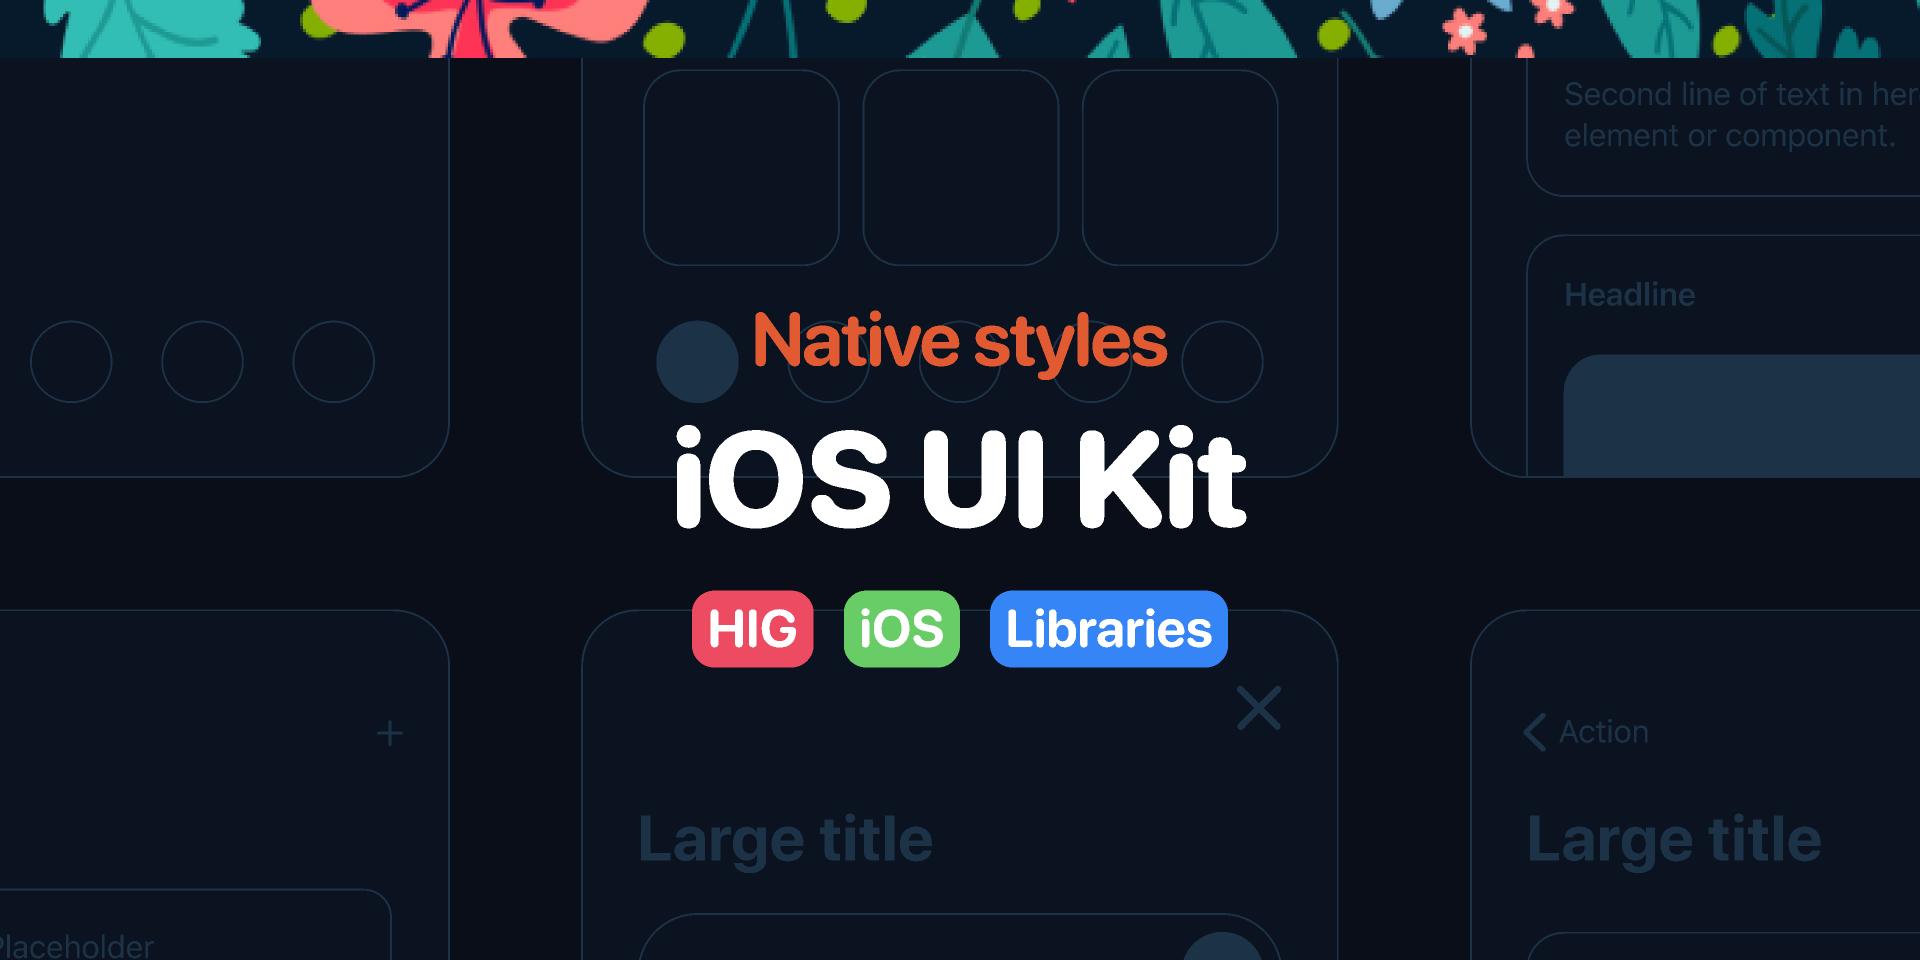 Free figma iOS UI Kit - Native styles Template